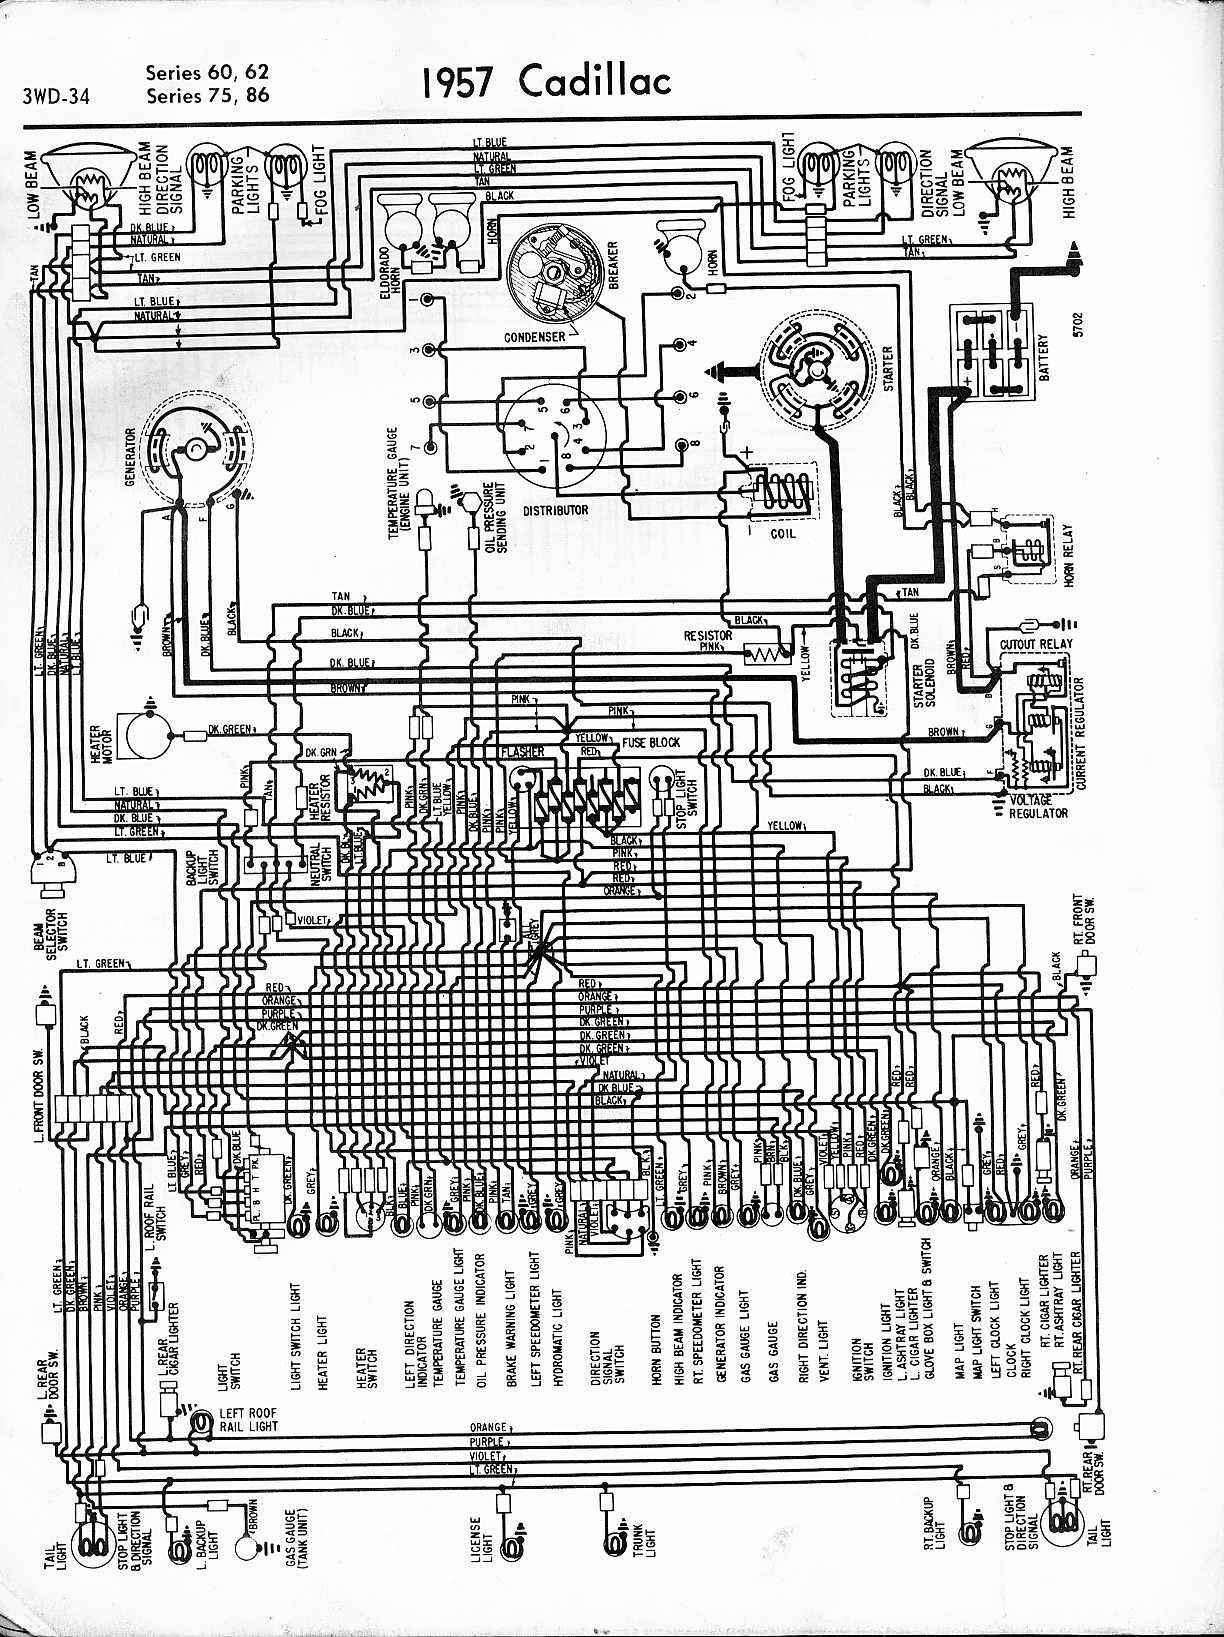 Ac Delco Wiper Motor Wiring Diagram Cadillac Wiring Diagrams 1957 1965